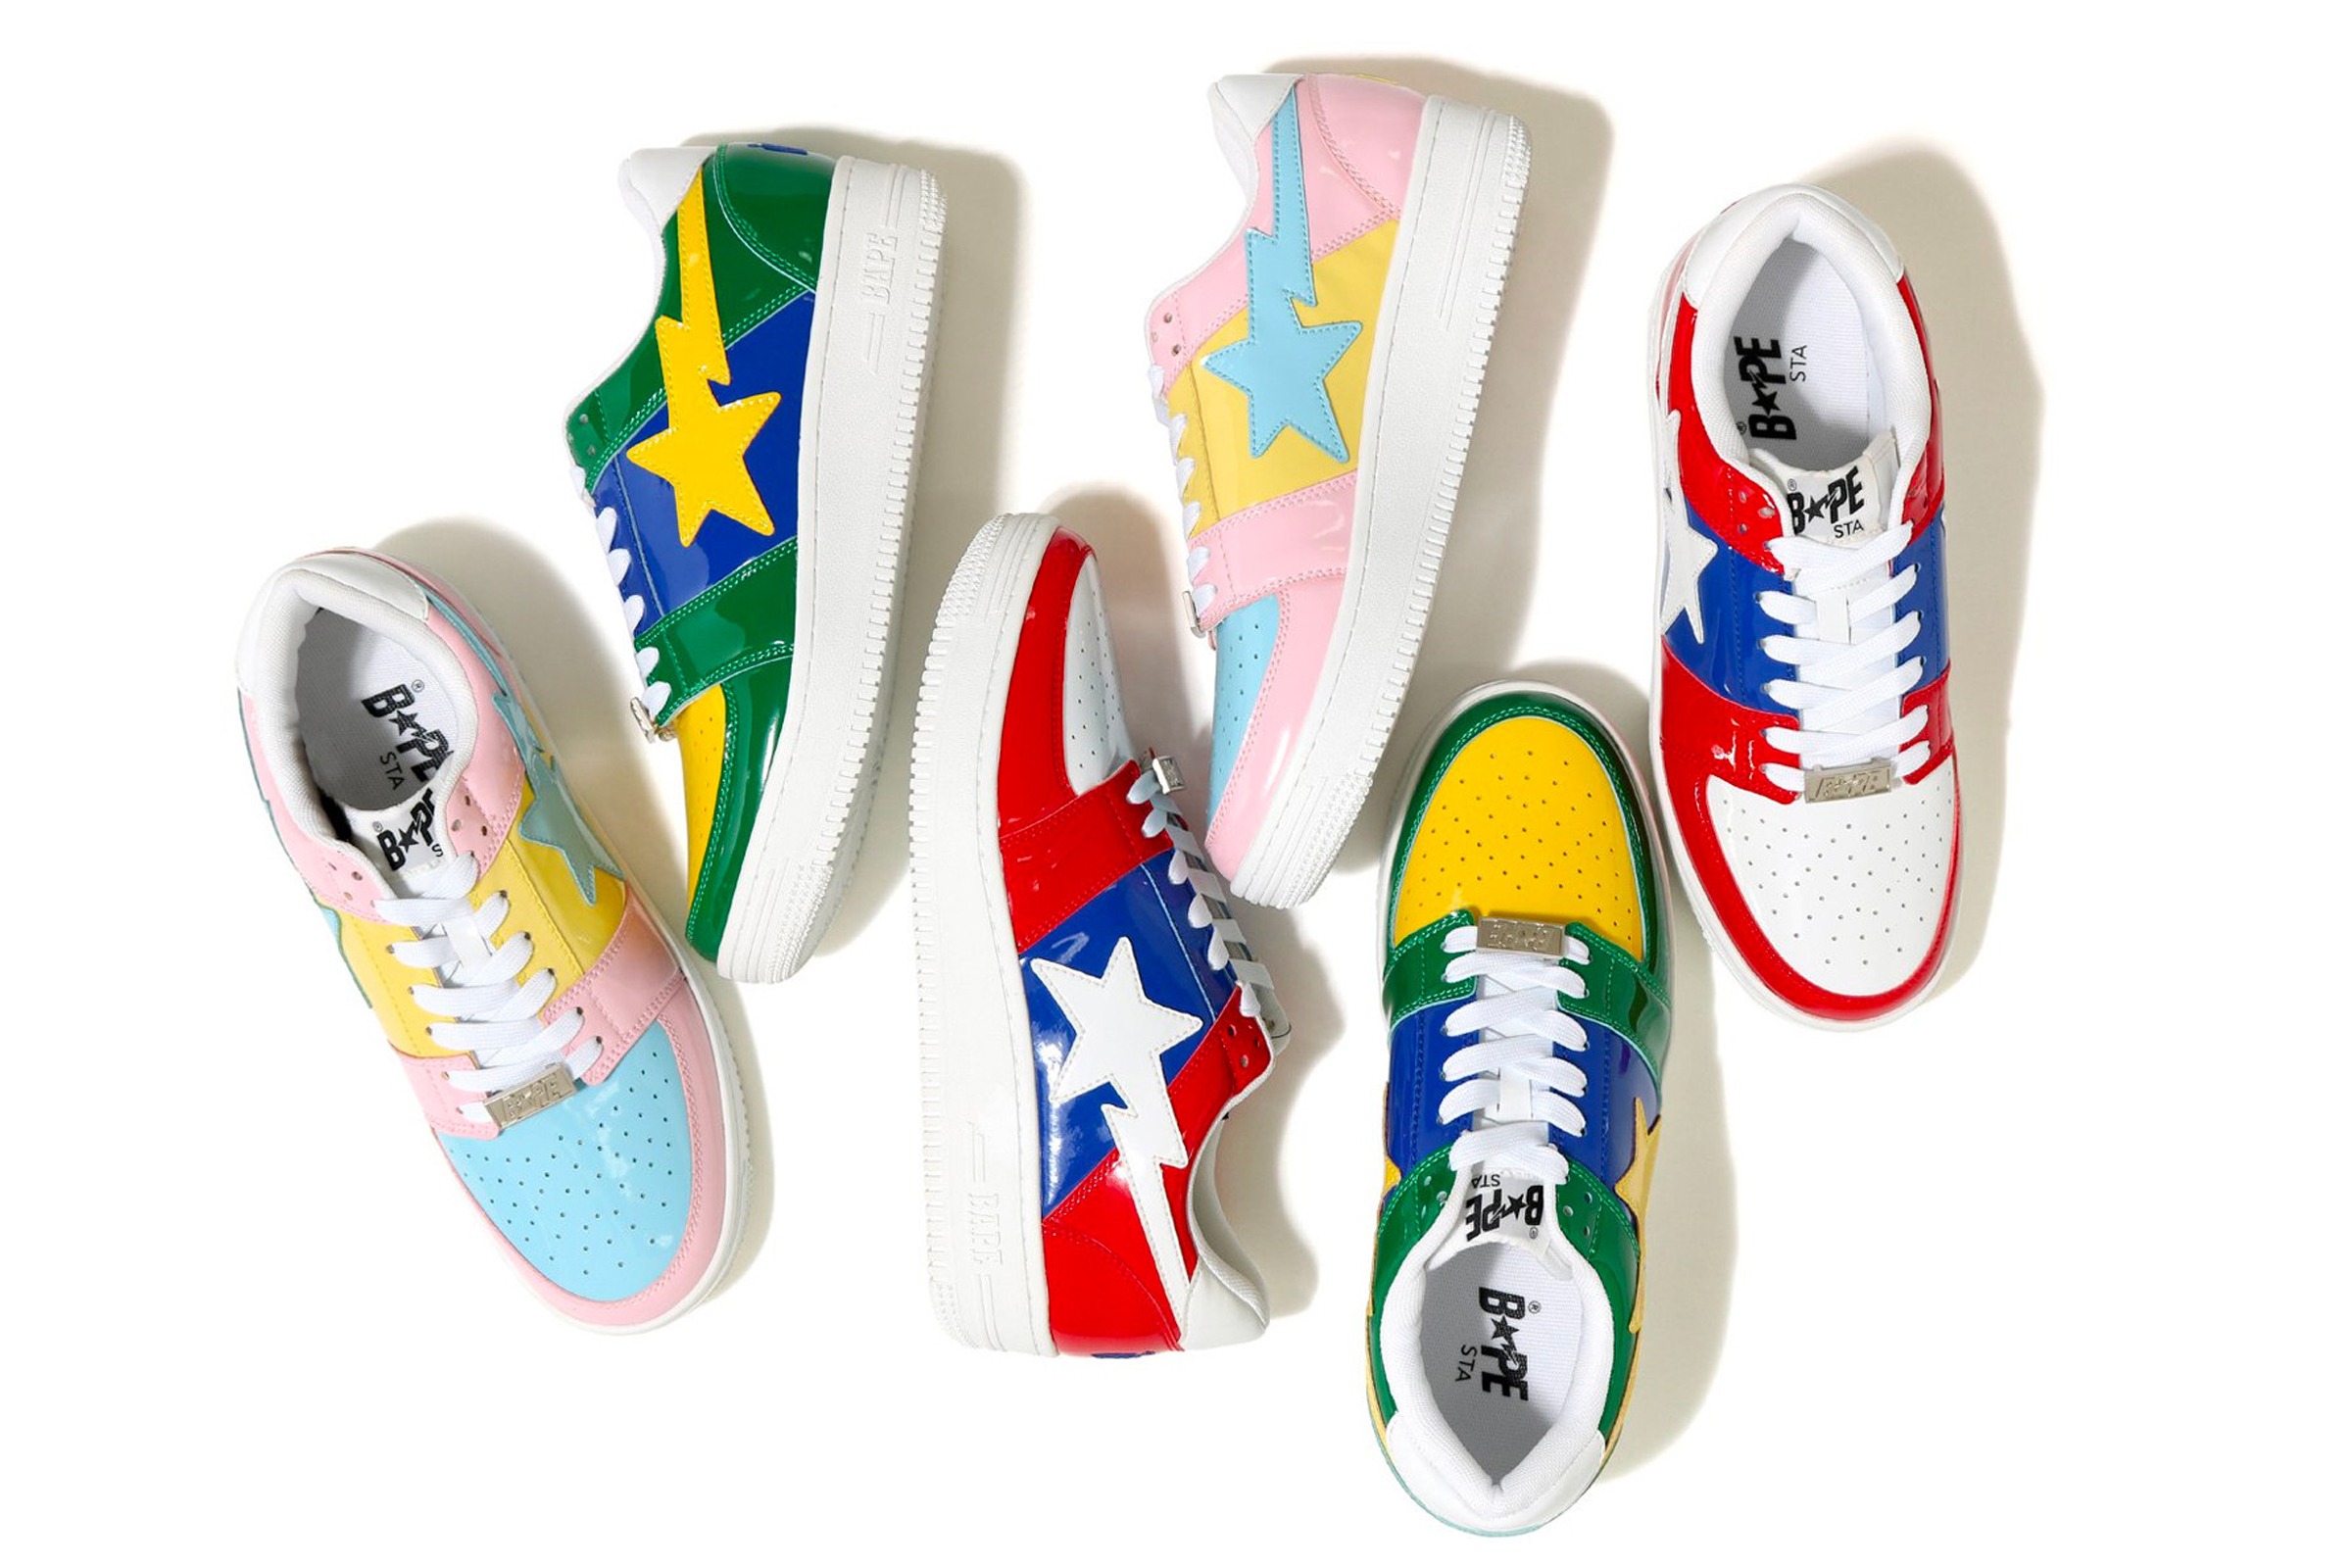 Imagine If Marvel Superheroes Were Iconic Nike Sneakers